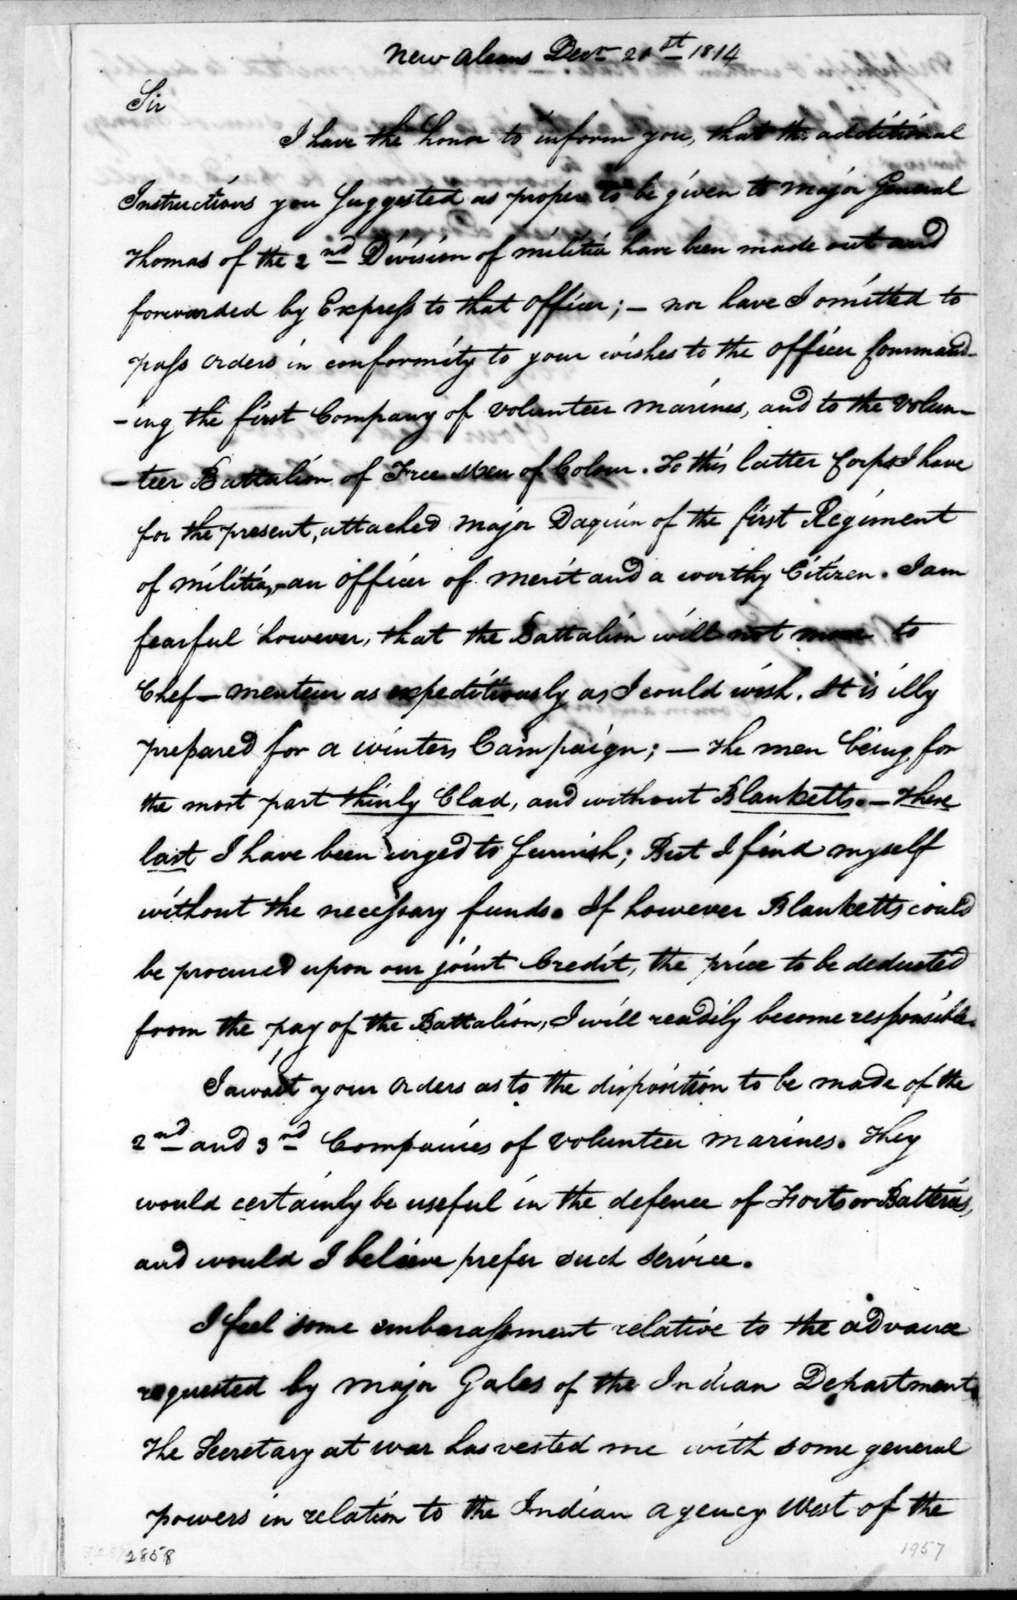 William Charles Cole Claiborne to Andrew Jackson, December 21, 1814